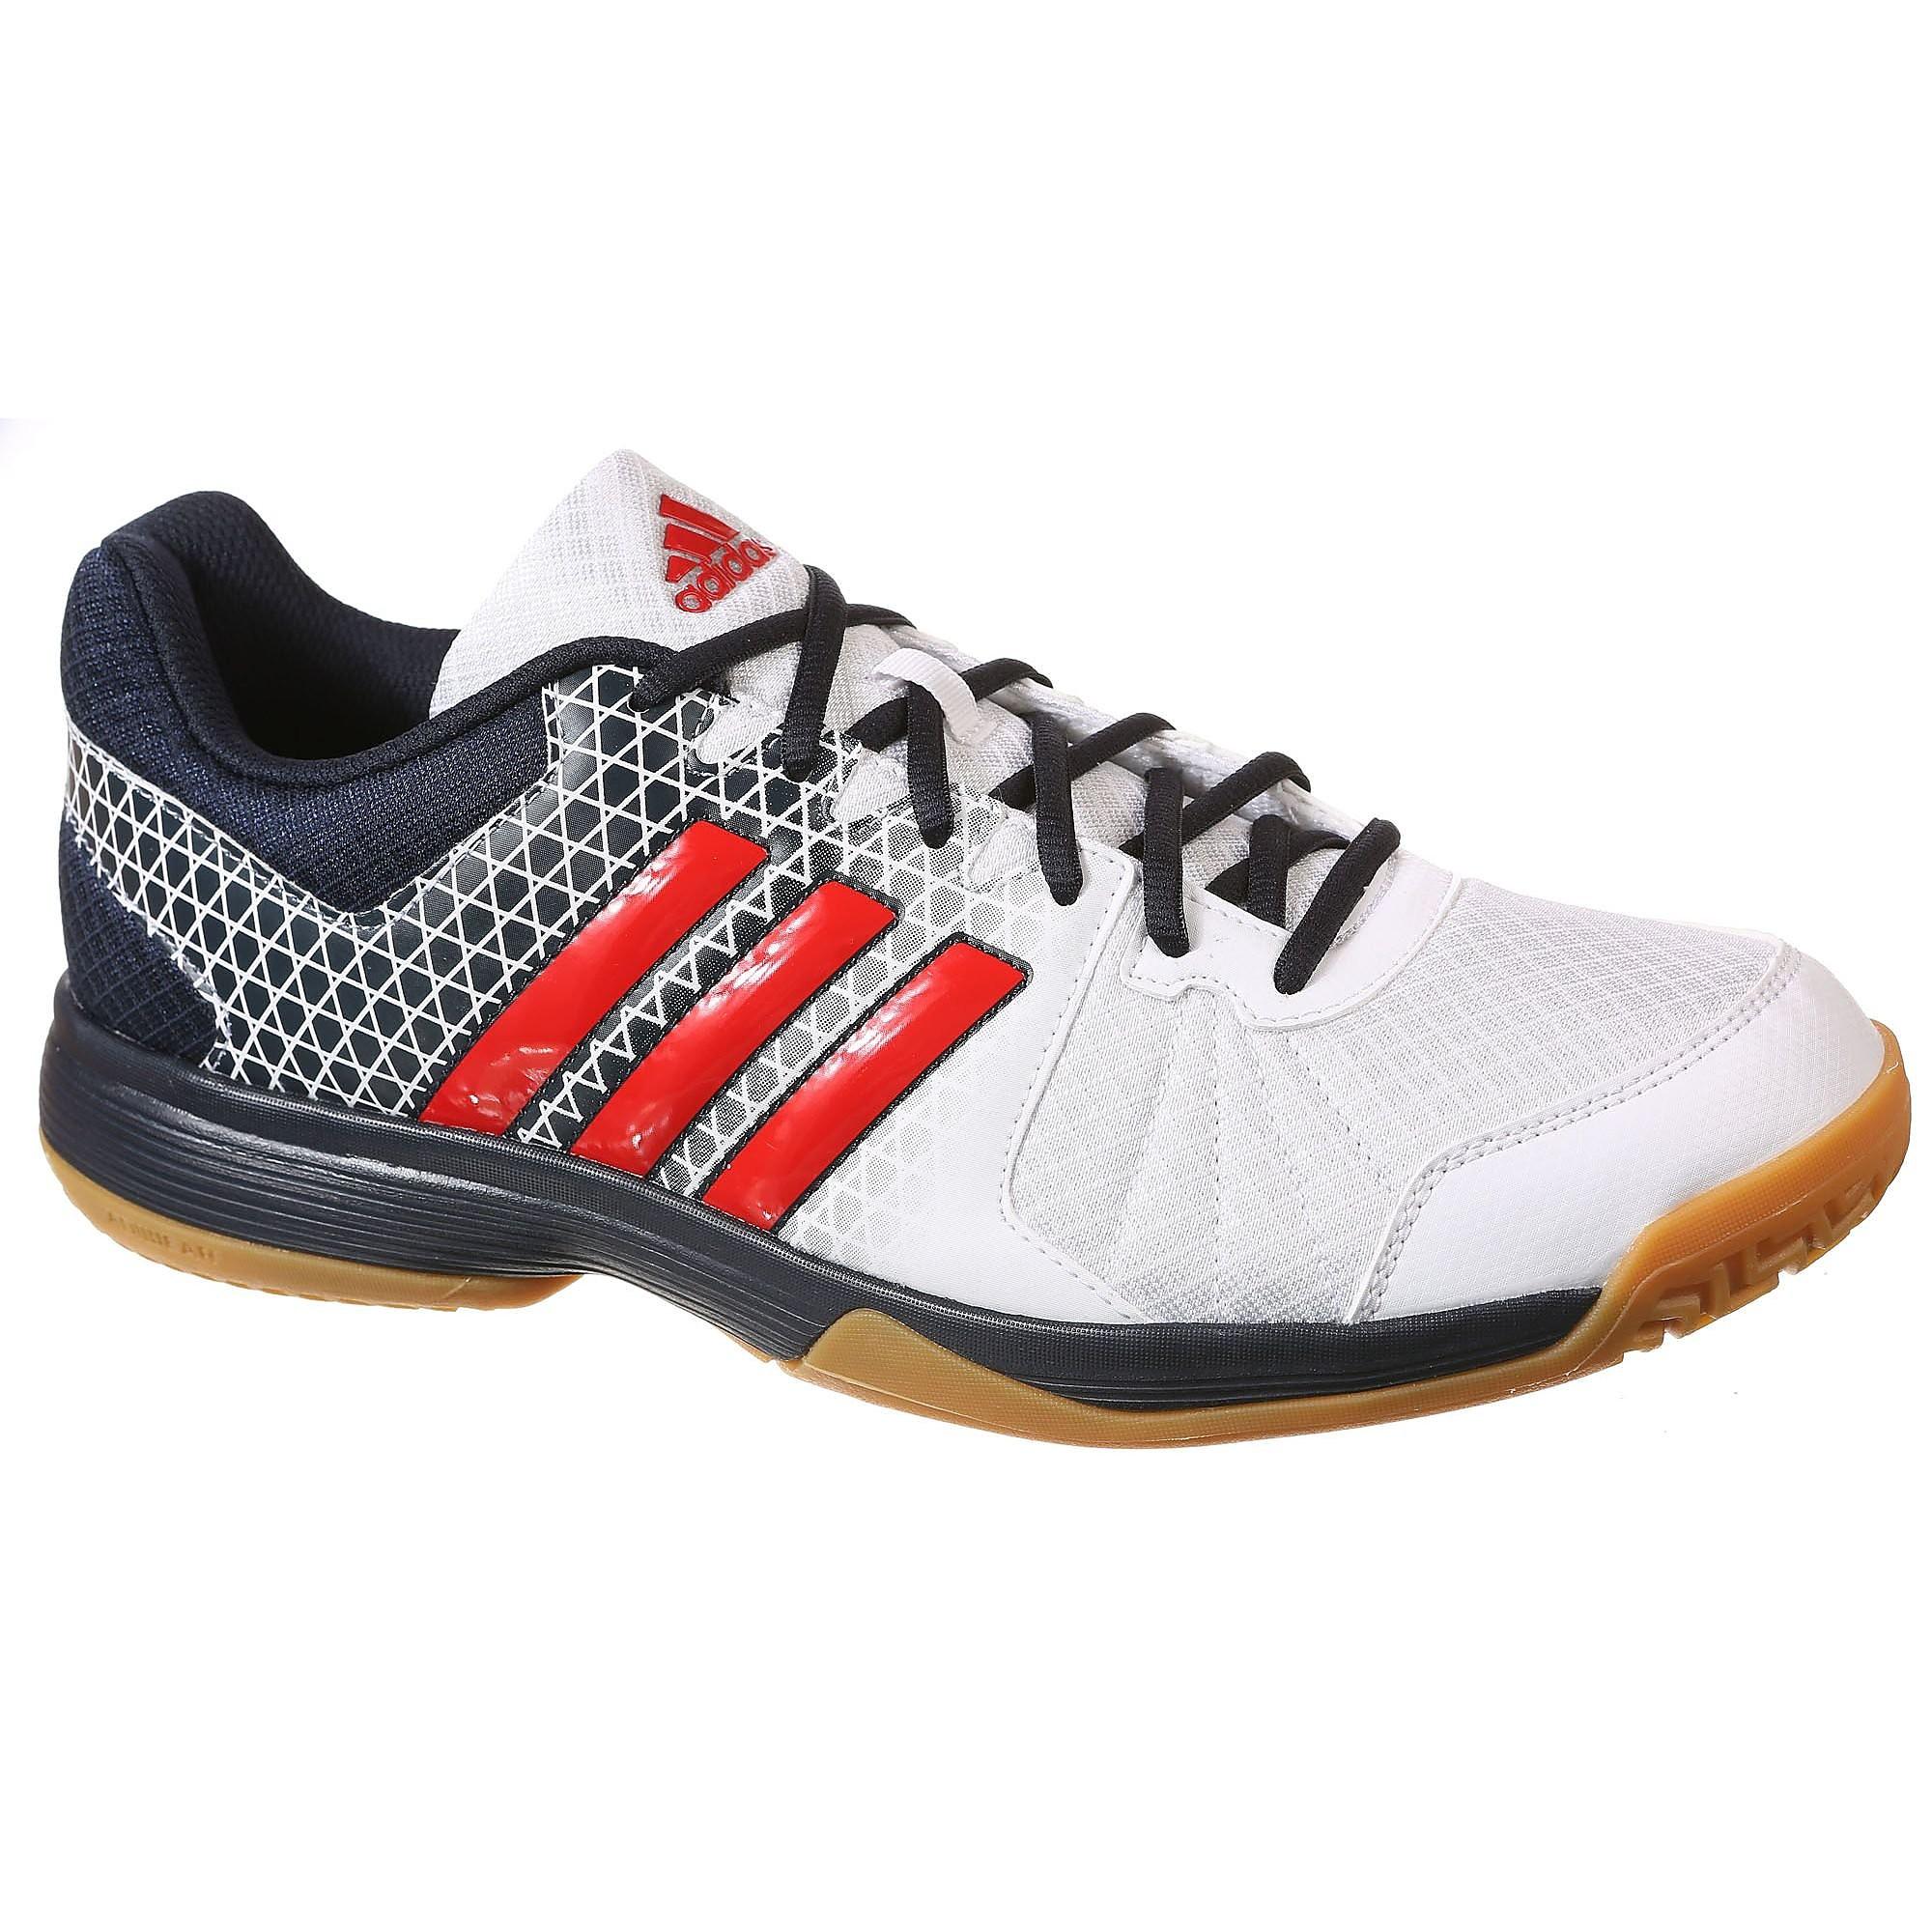 Sportschoenen adidas Ligra 4